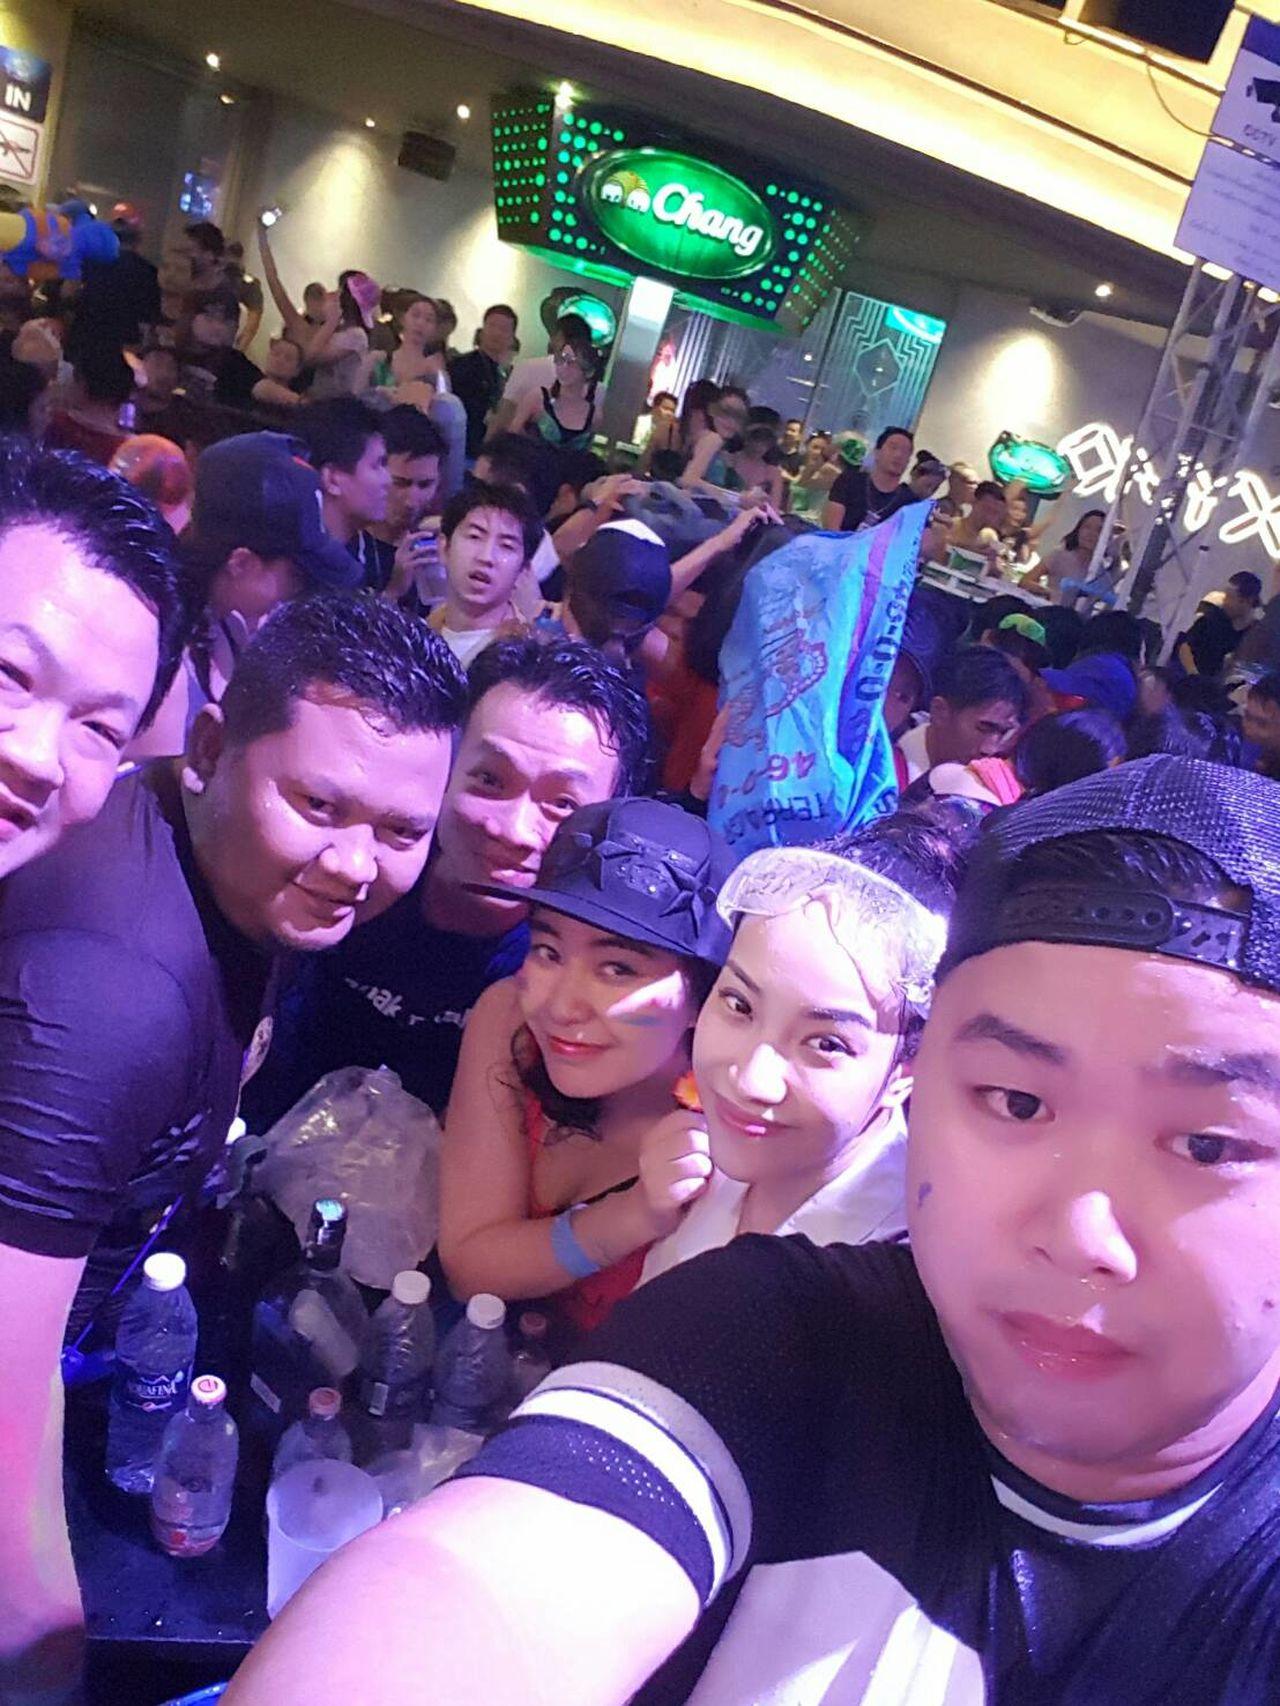 Party Dancing Music Dj Set Cool Crowd Songkran Festival Watersplash Songkran 2016 Bangkok Thailand. Colour Of Life Festival Season Music Brings Us Together Music Is My Life